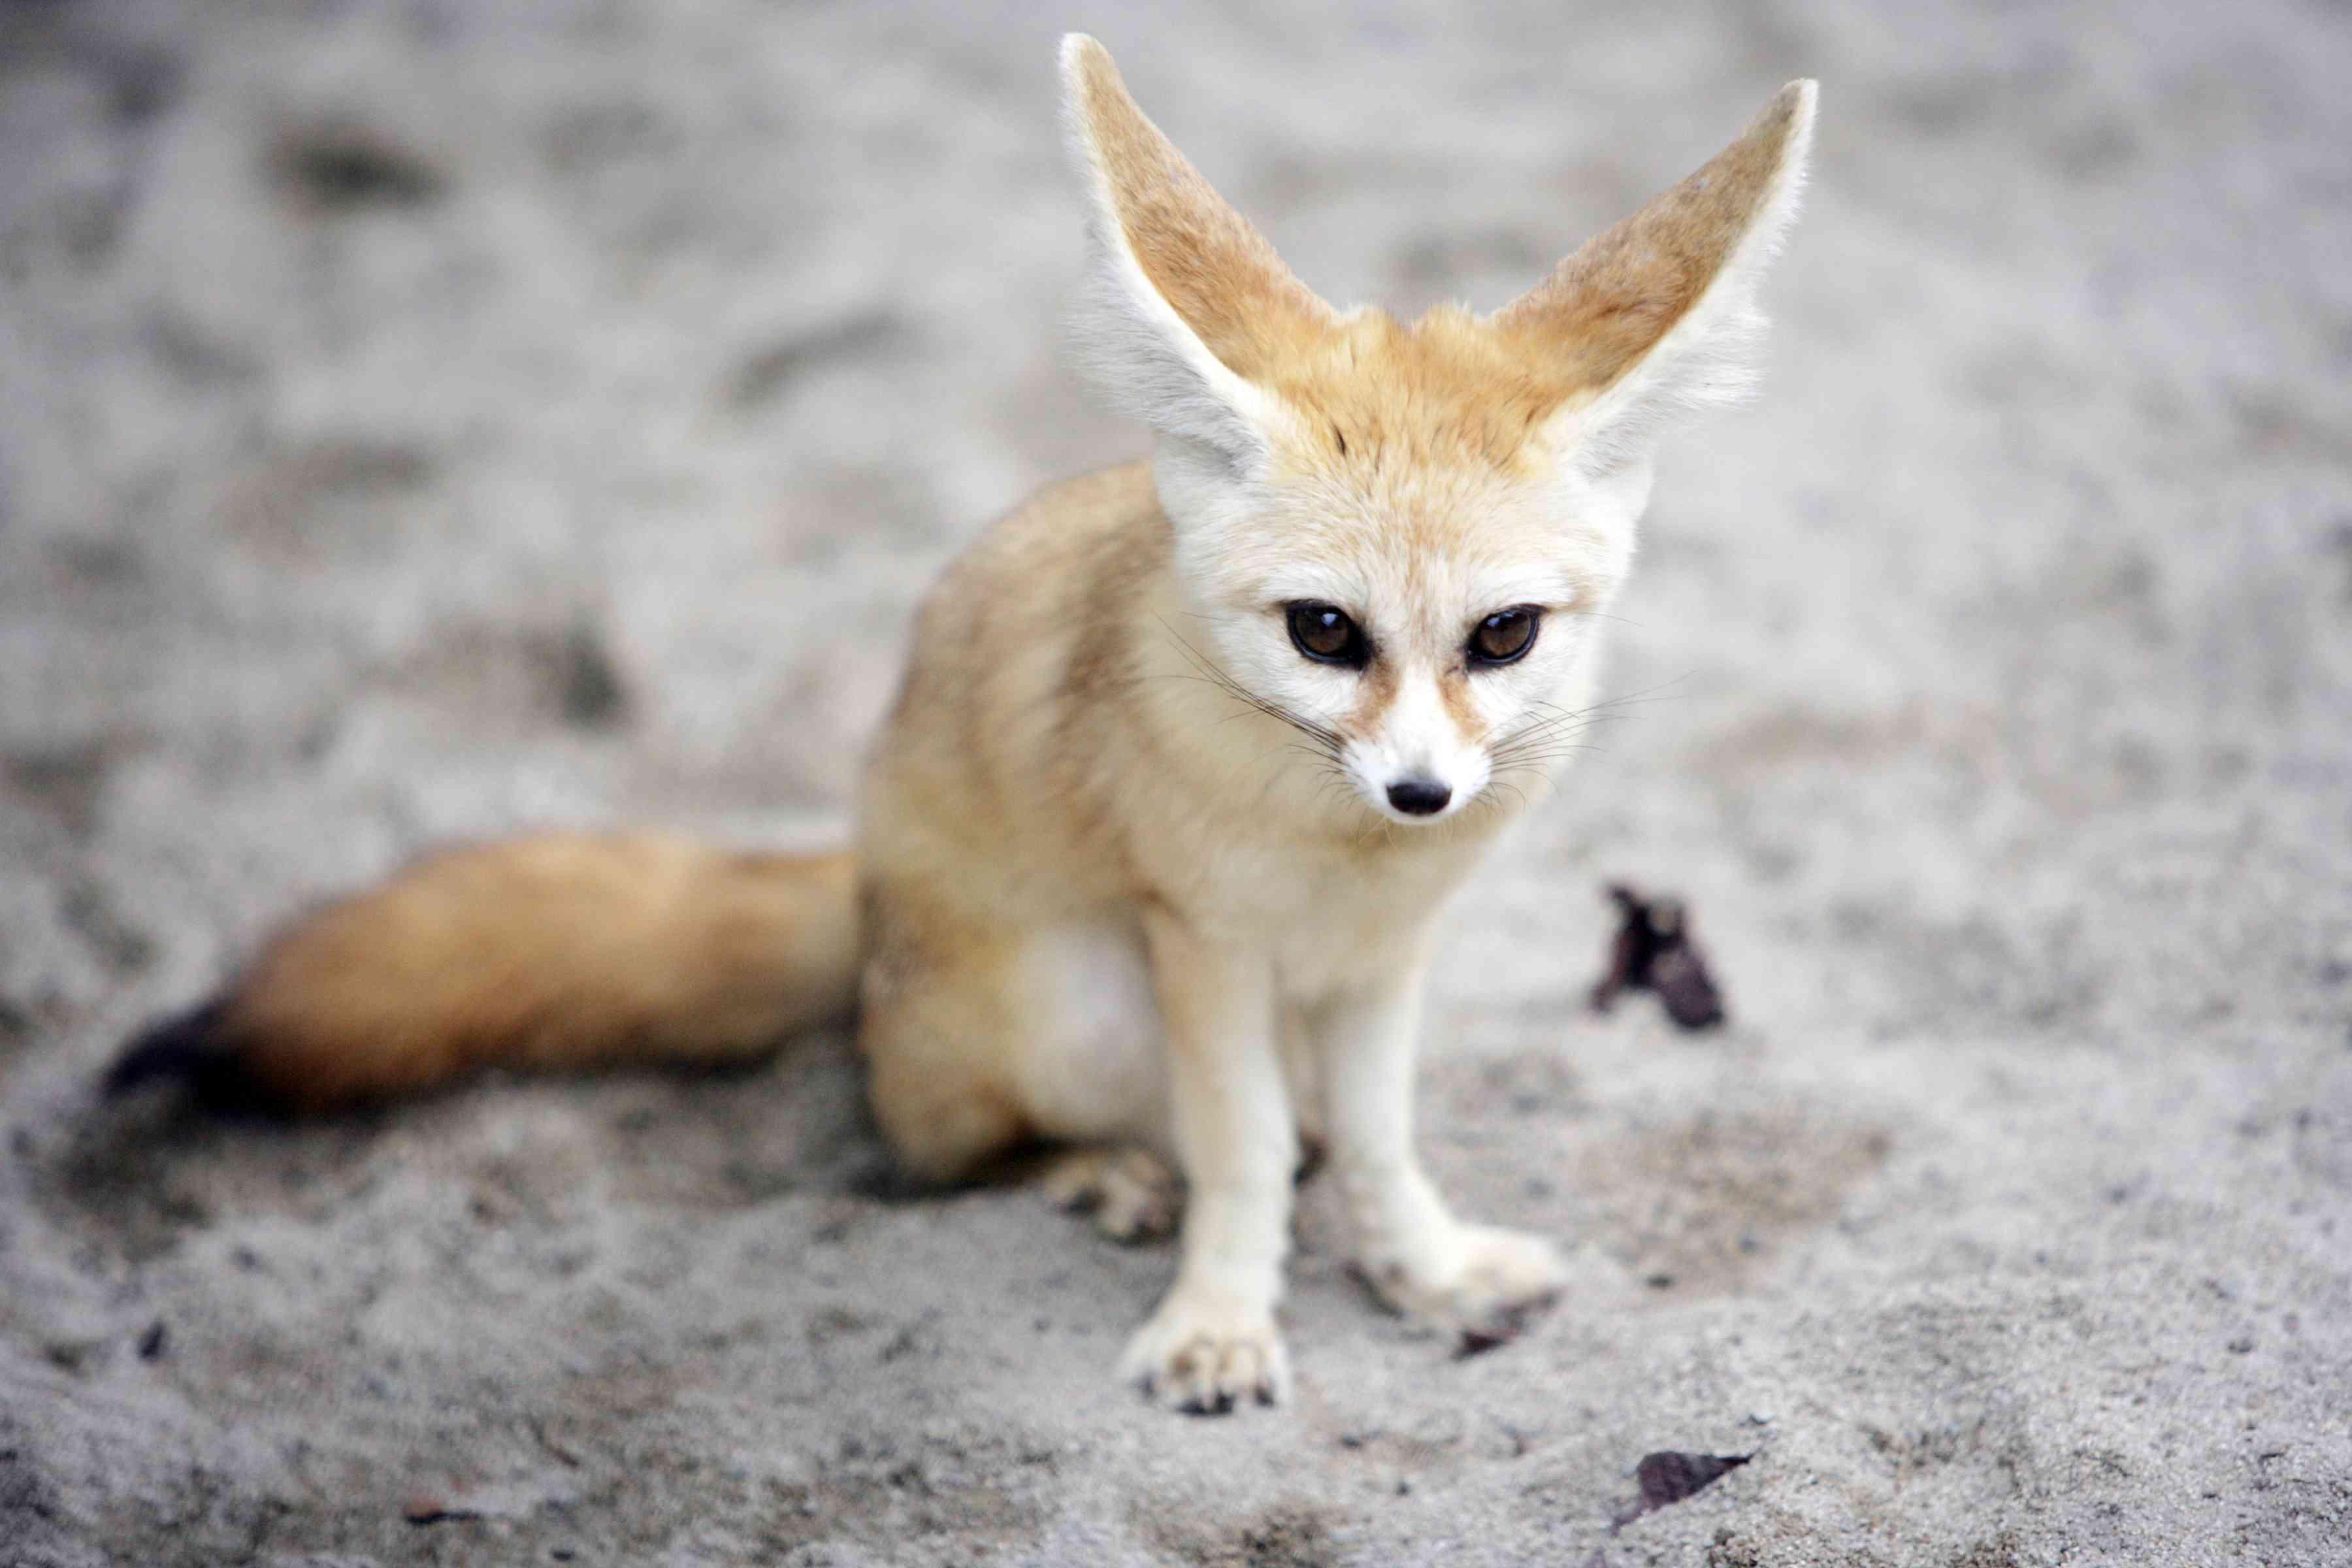 Fennec fox sitting in the sand